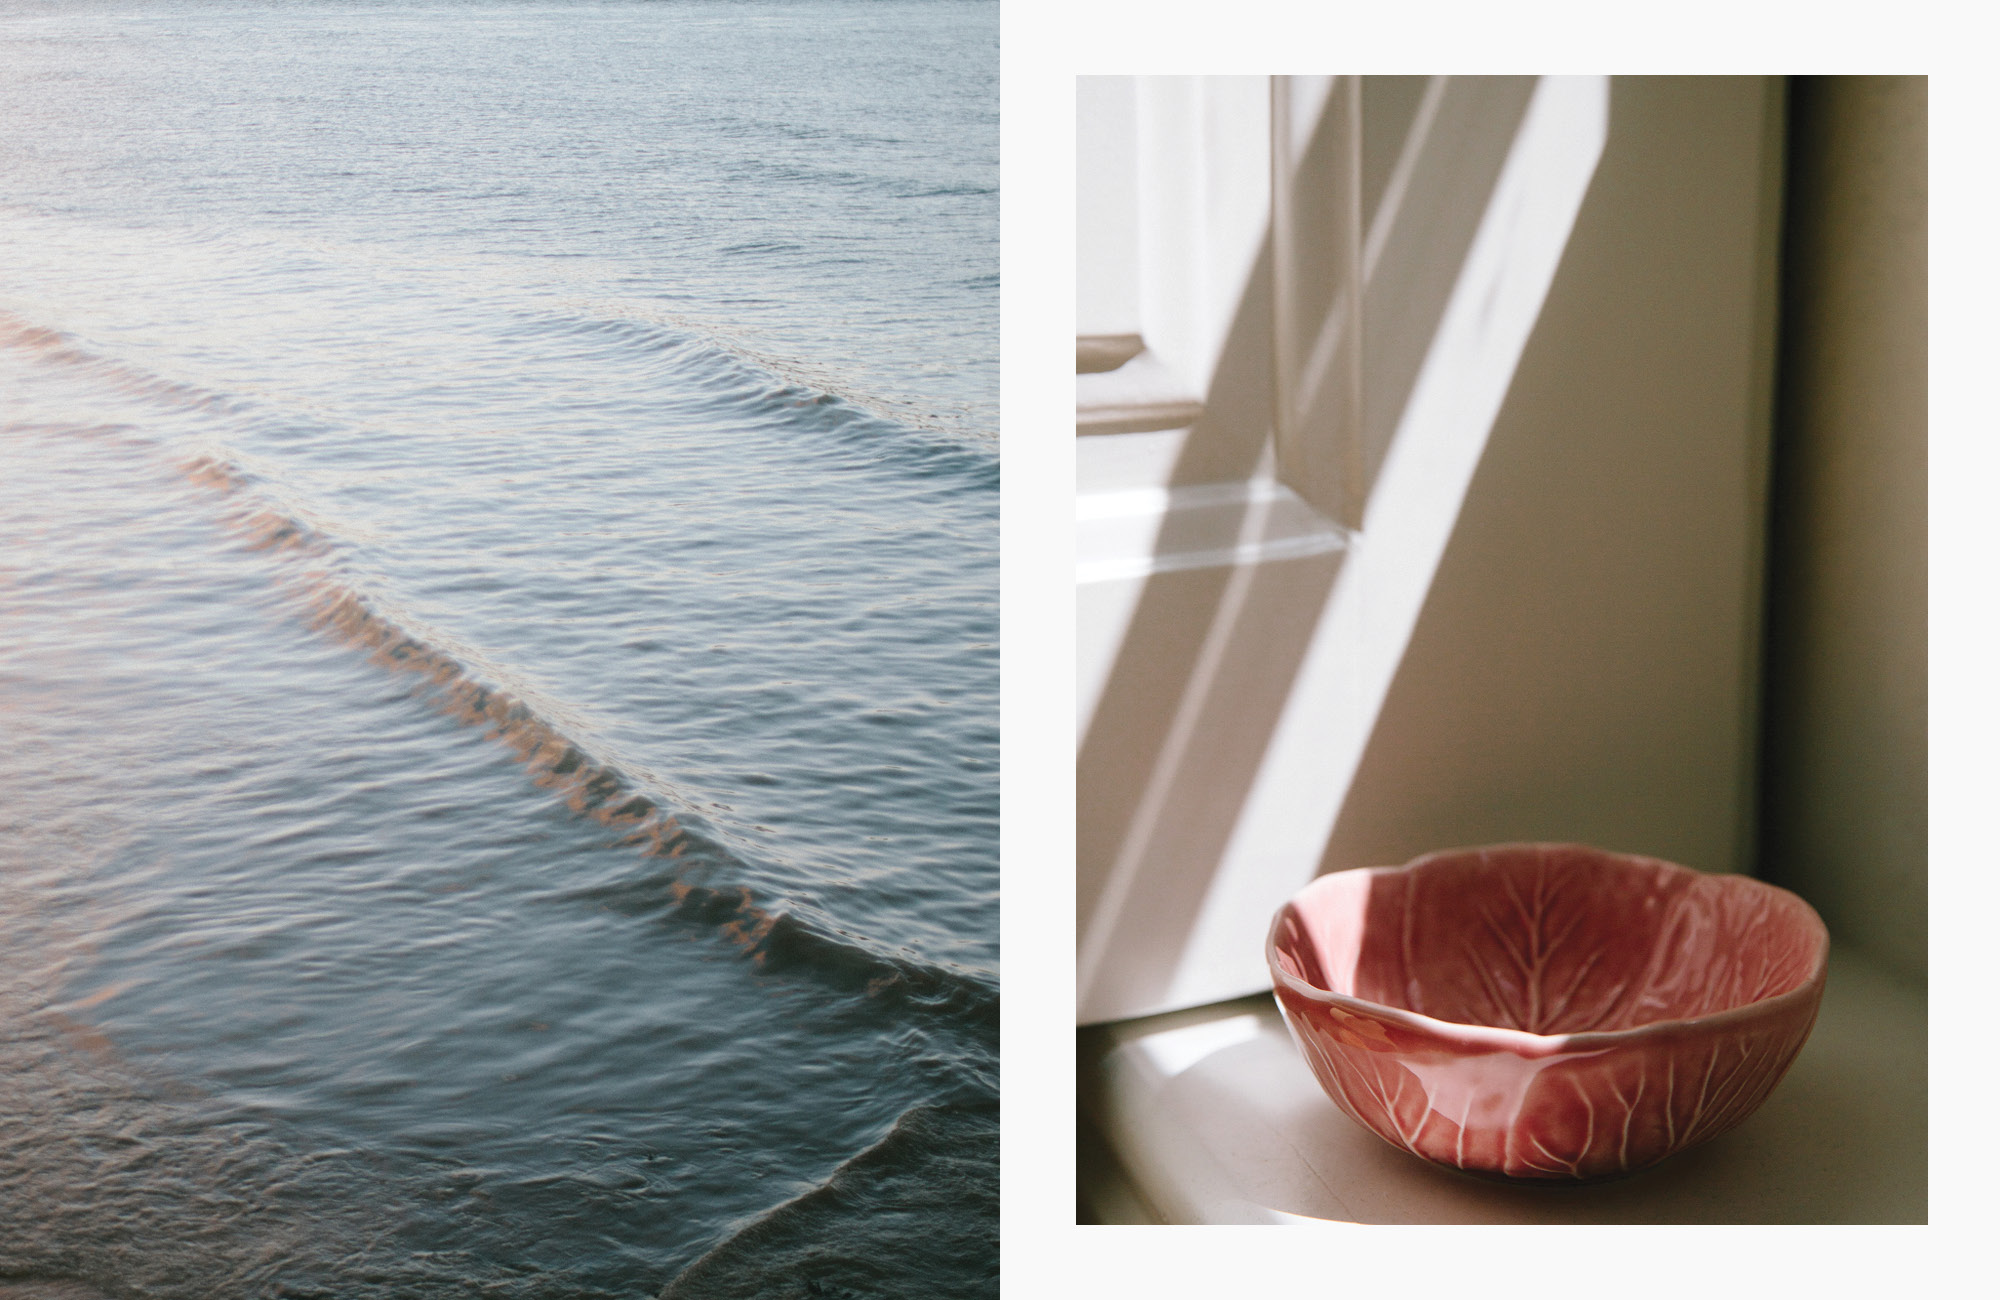 Food-Editorial-Photographers-Porto-Portugal-Oceanica-Studio.jpg